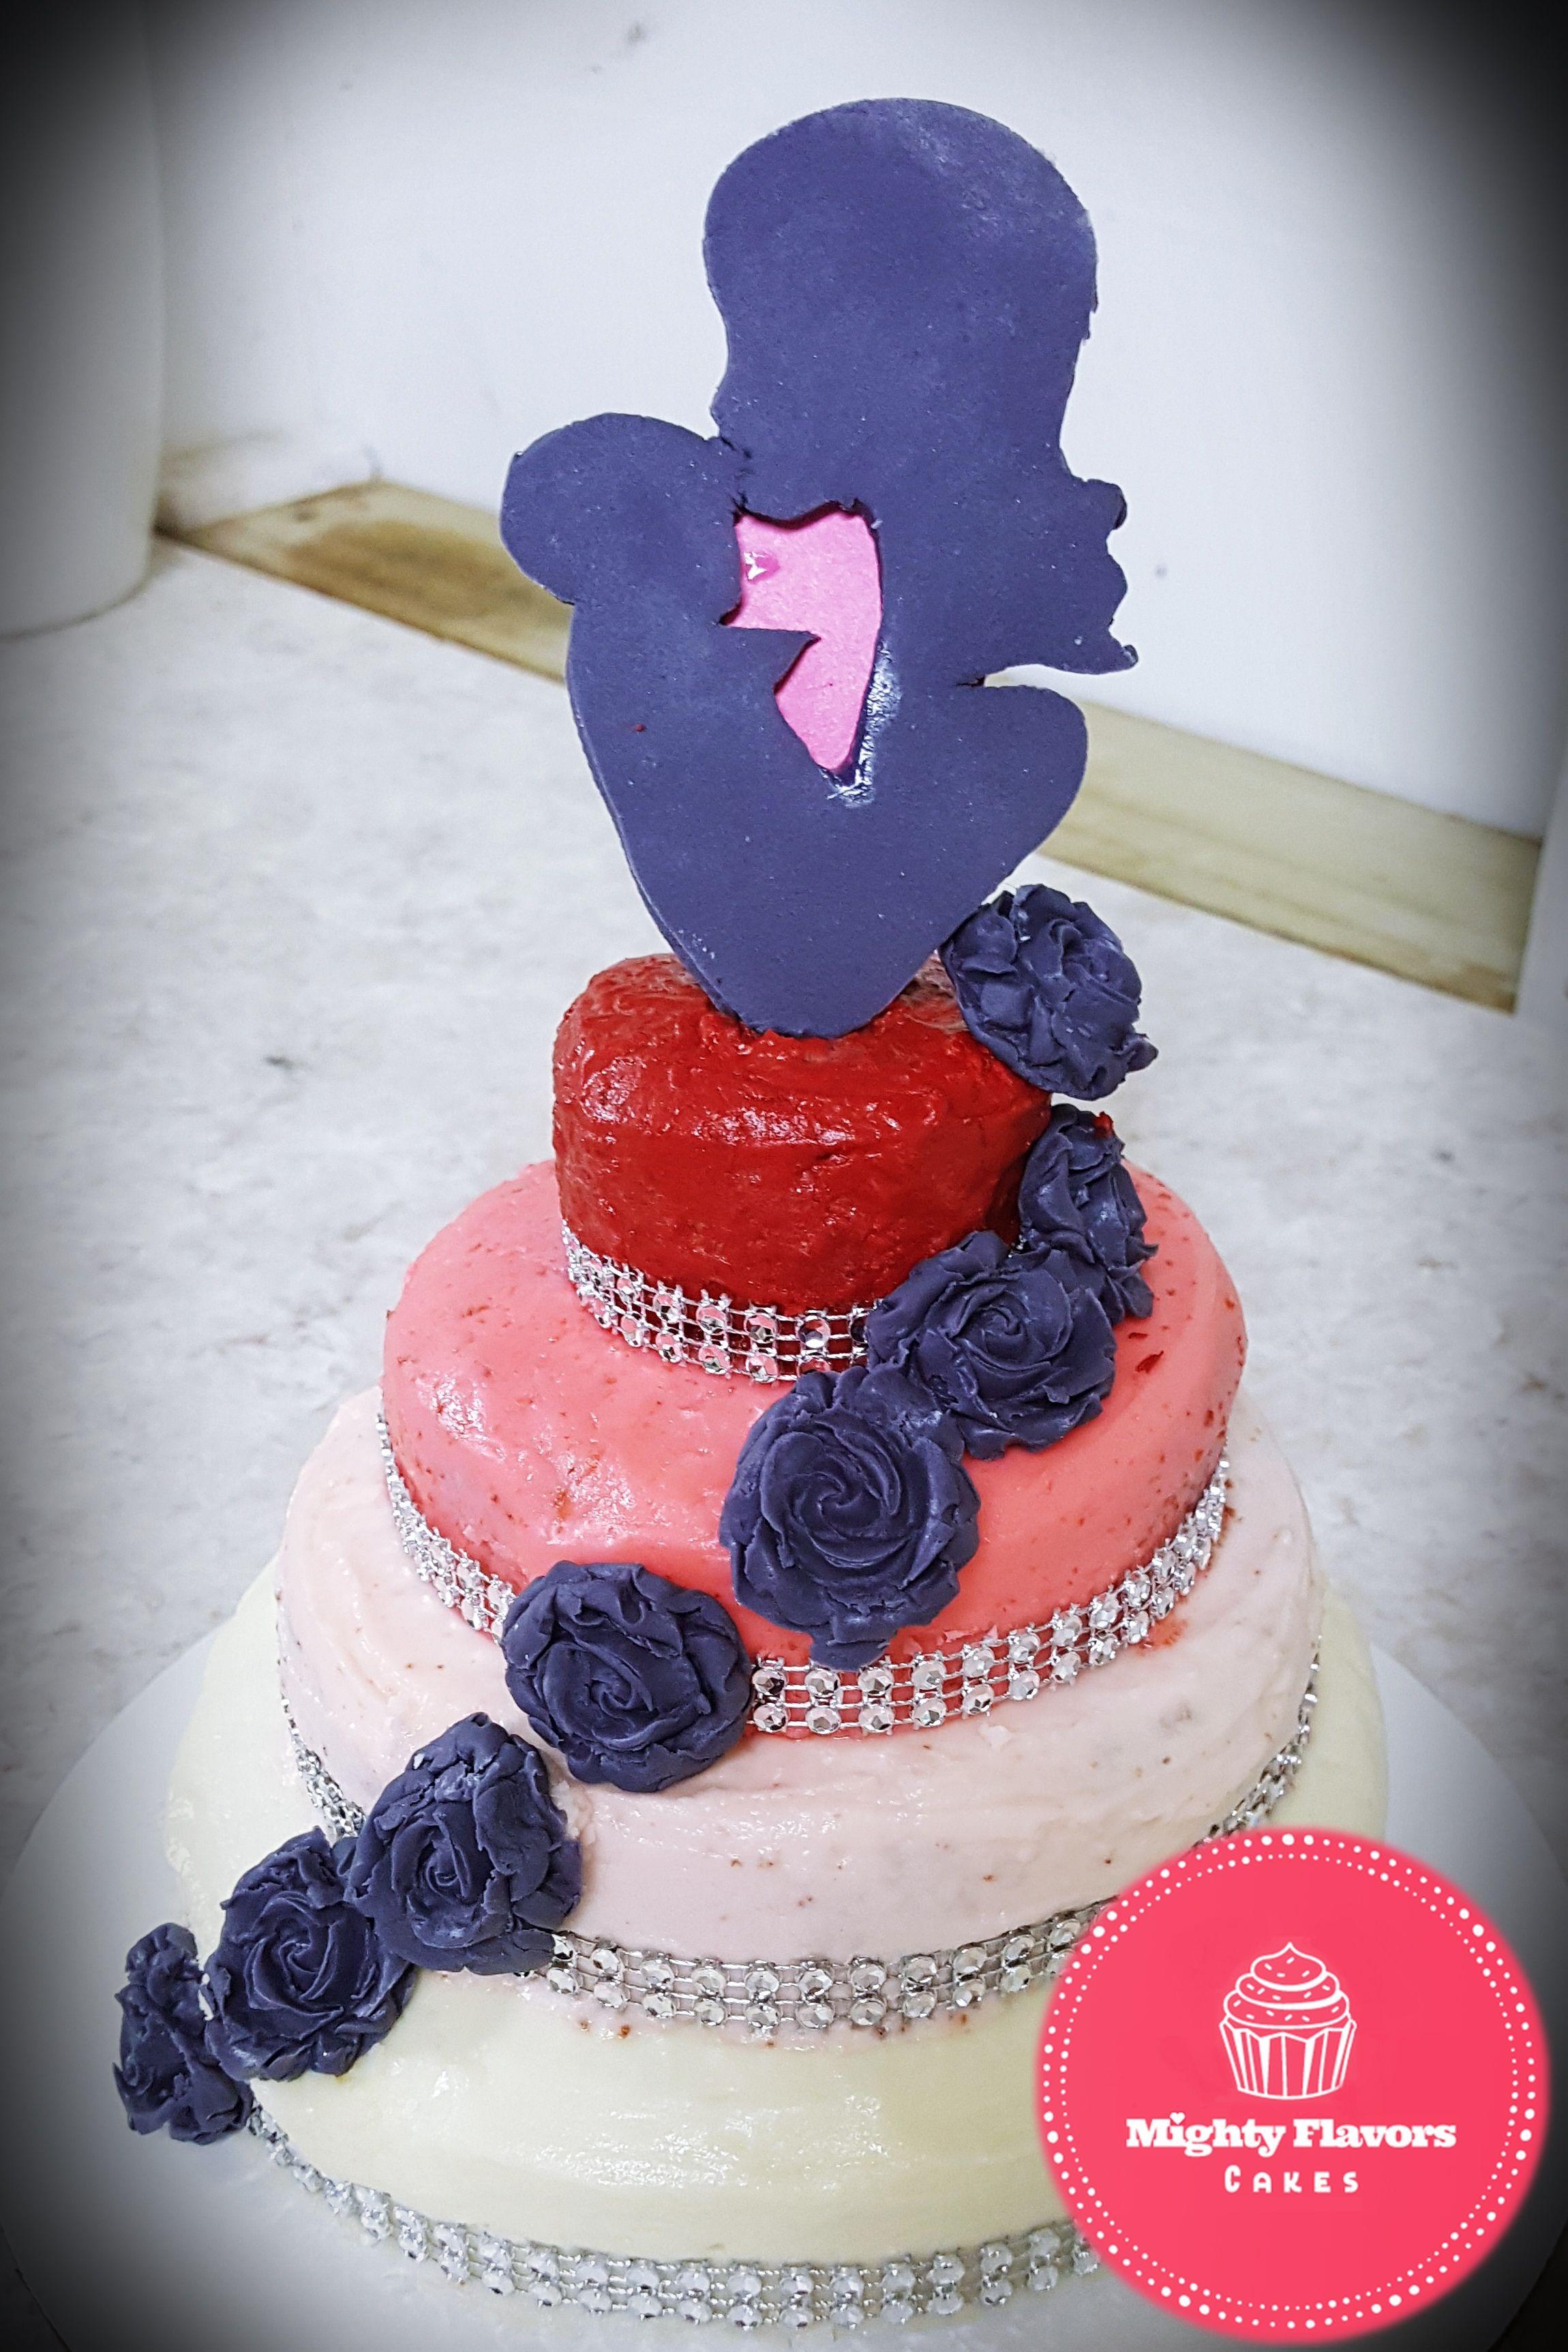 mother n daughter cake cakes mfc pinterest cake daughter